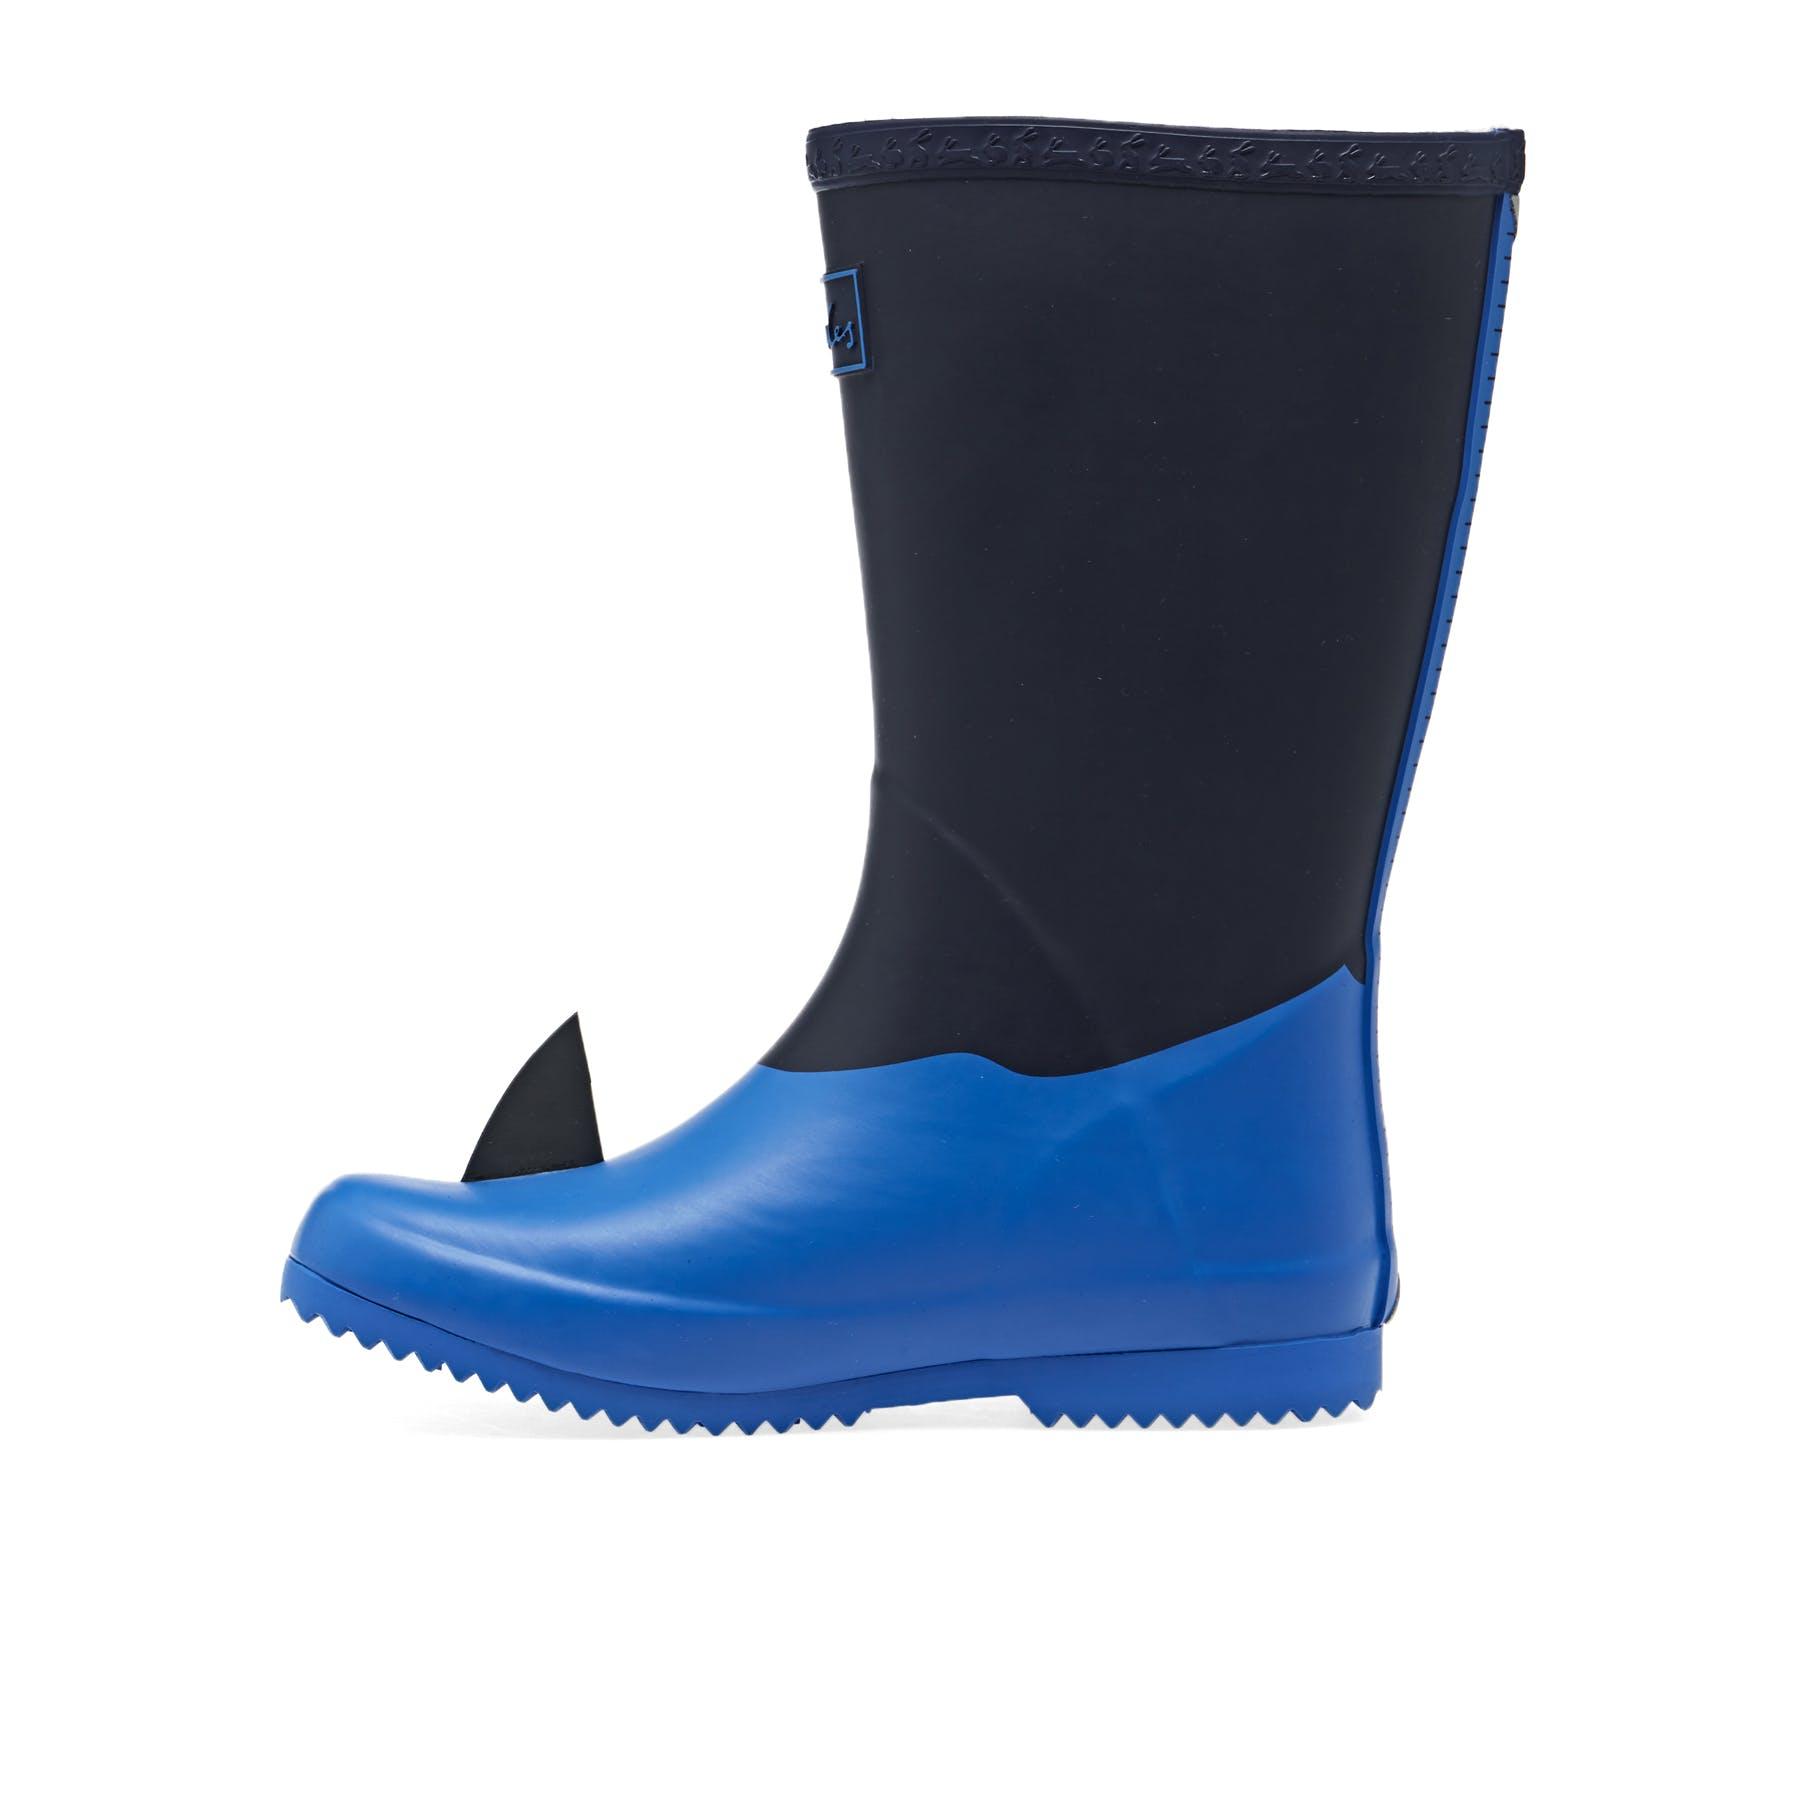 Joules Junior Roll Up Garçons Bottes Wellington-Bleu Marine Shark Toutes Les Tailles